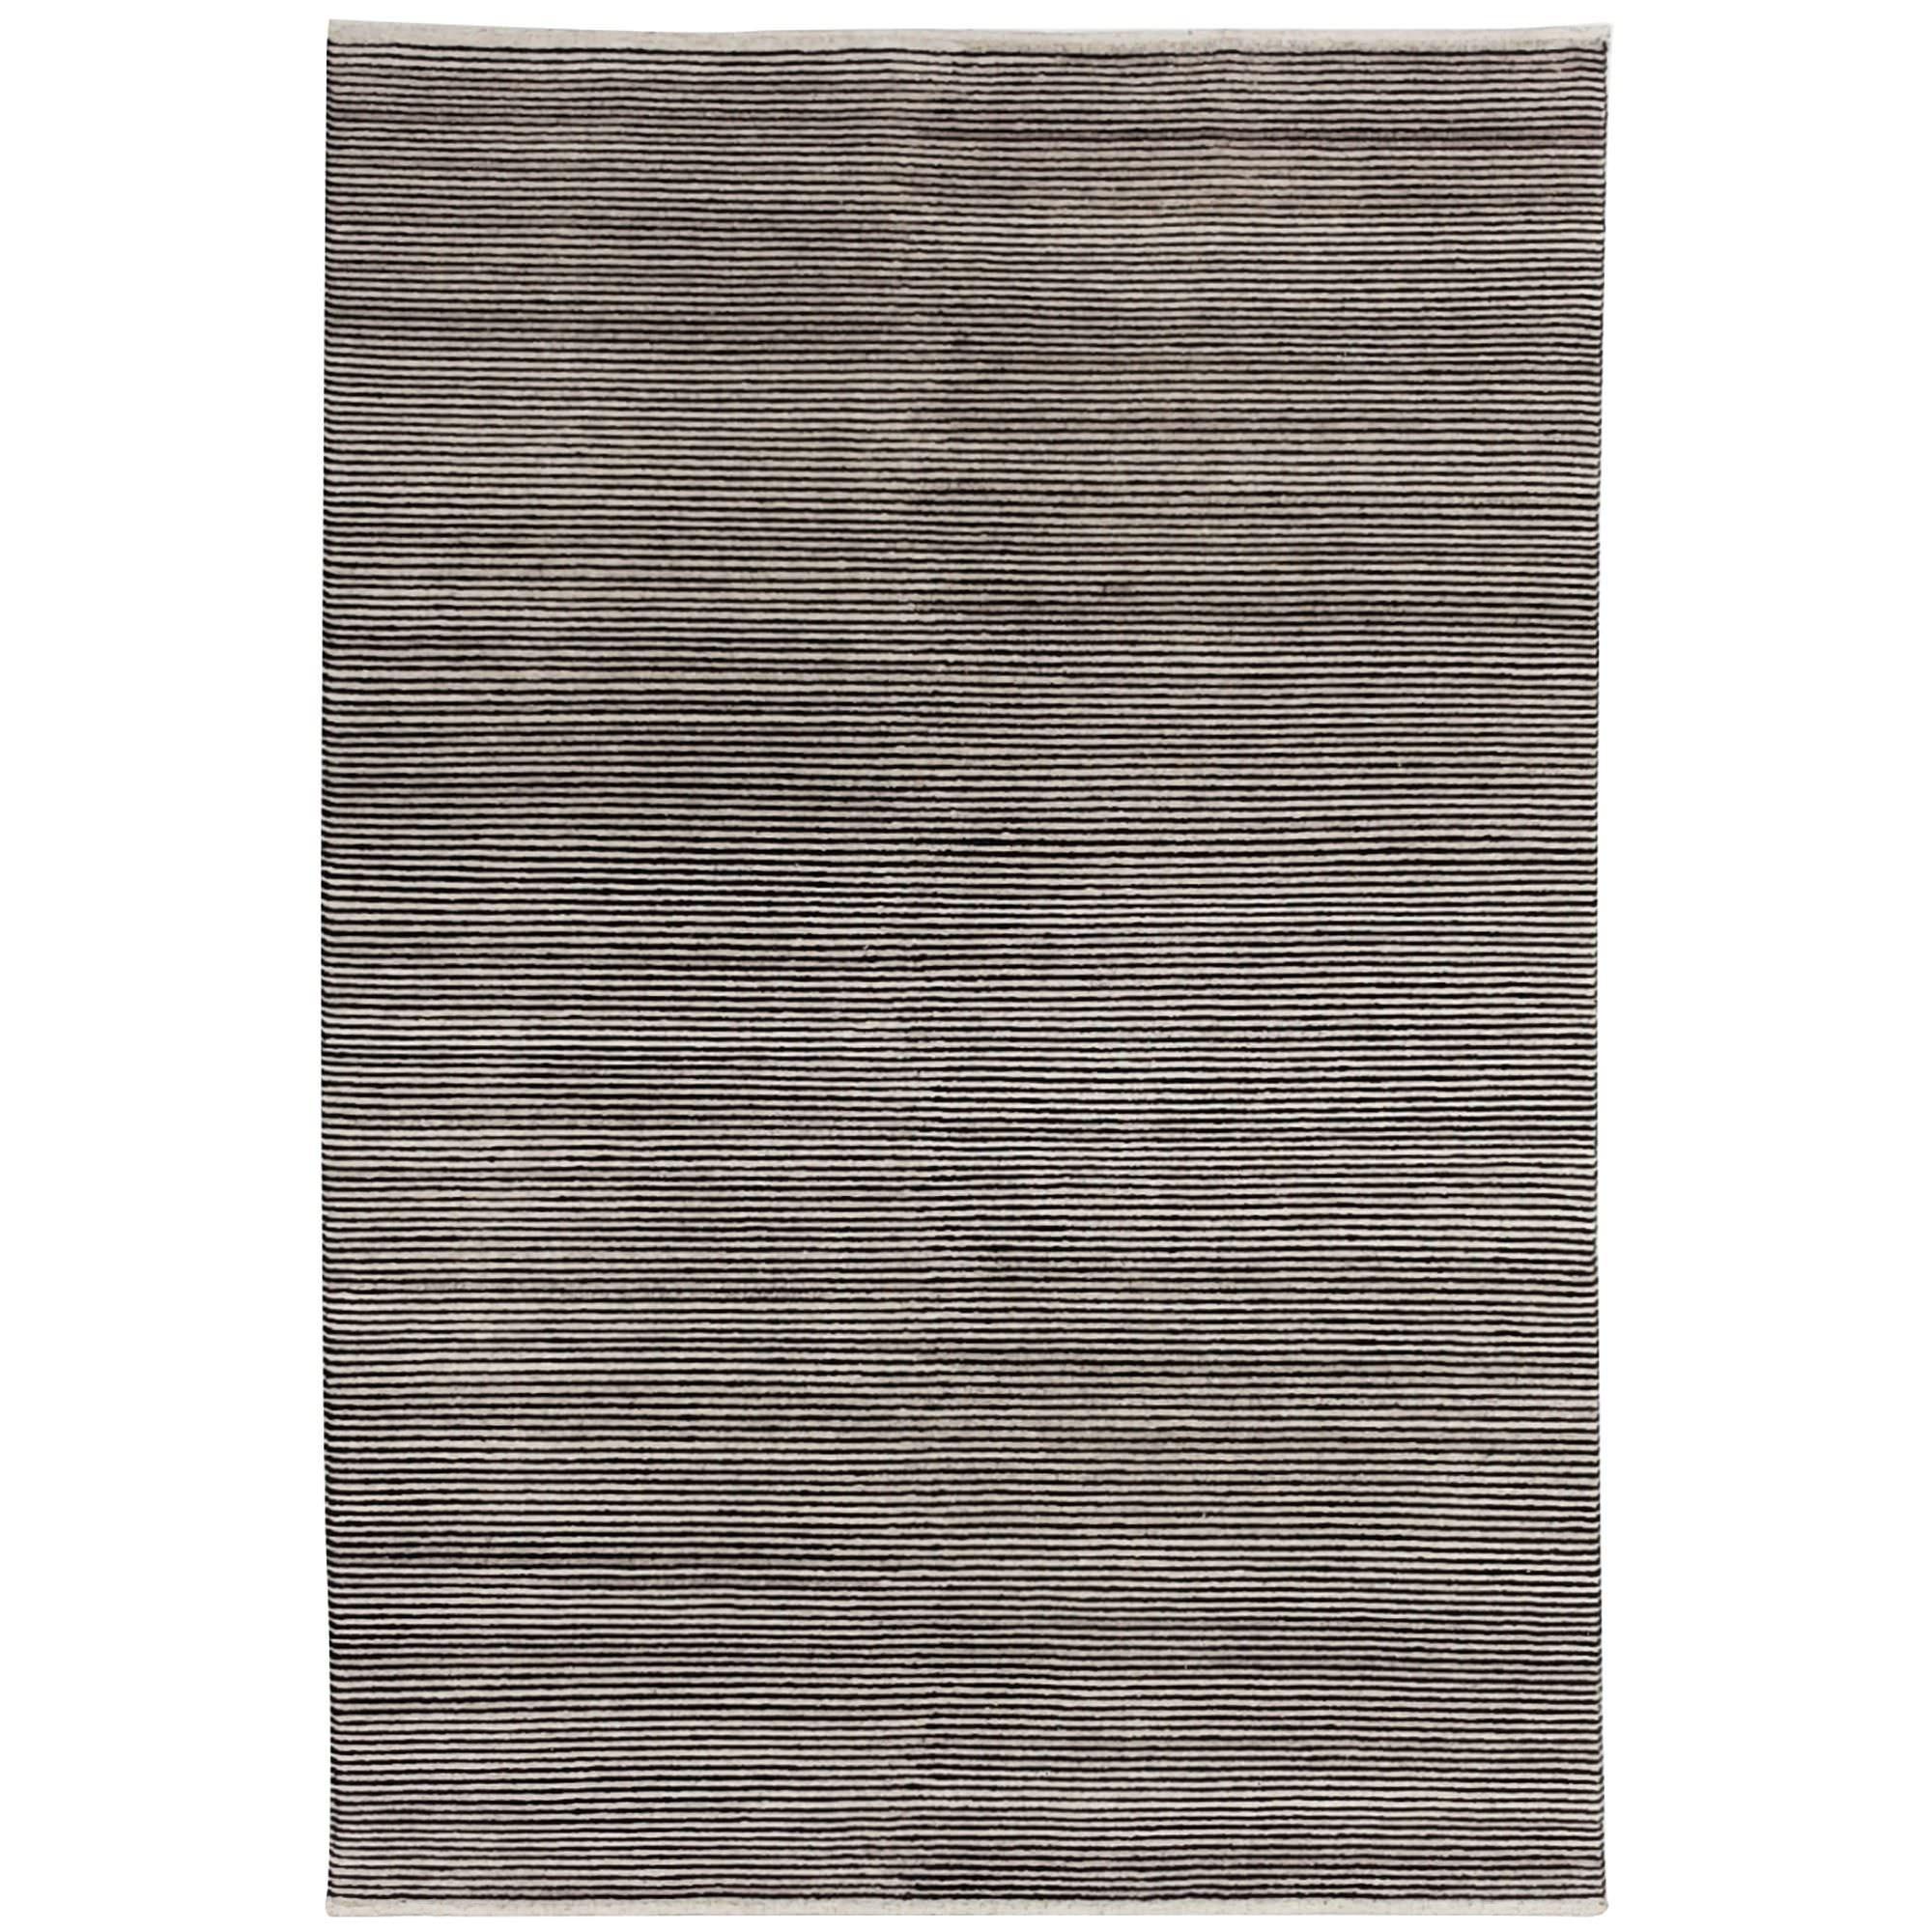 Boheme Hand Tufted Wool Rug, 200x300cm, Charcoal